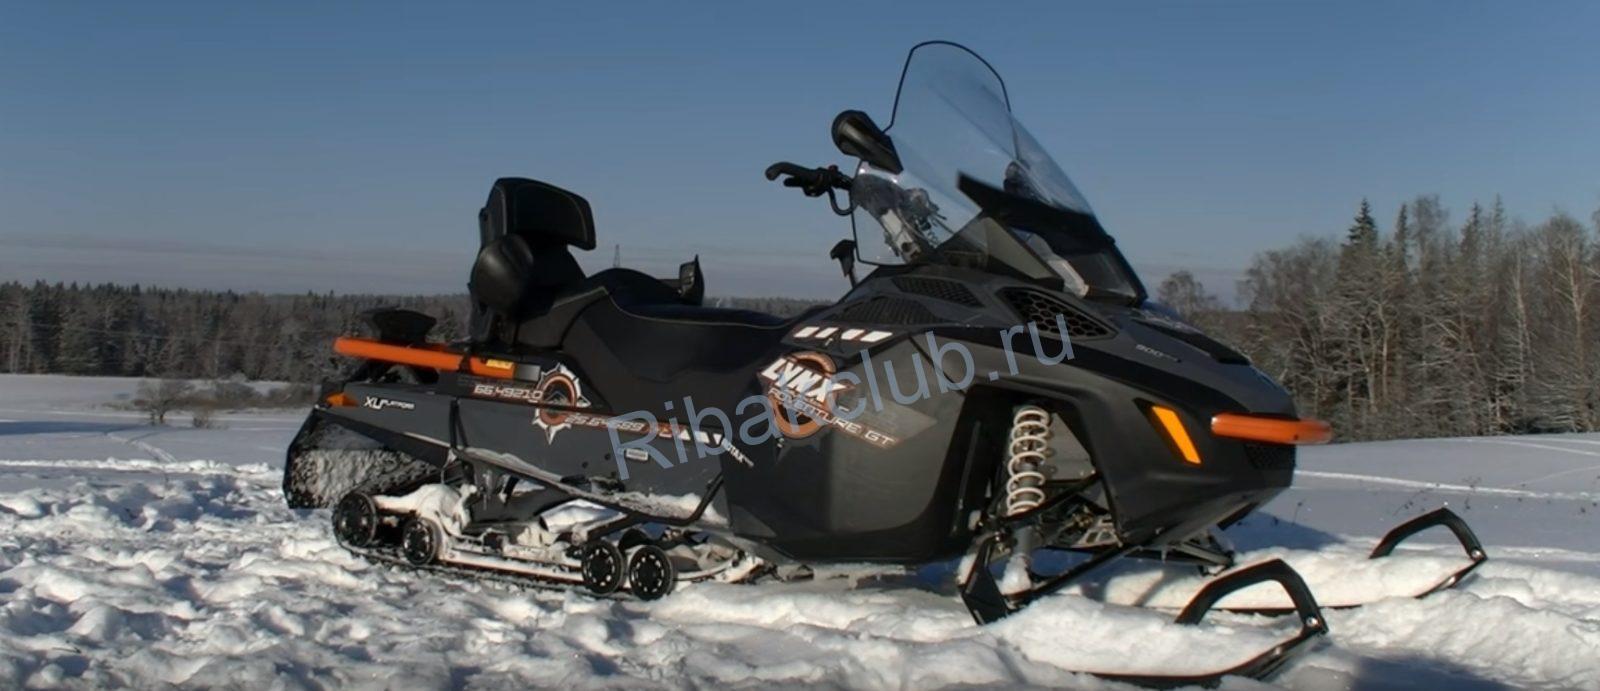 Транспорт для зимней рыбалки. Снегоход.